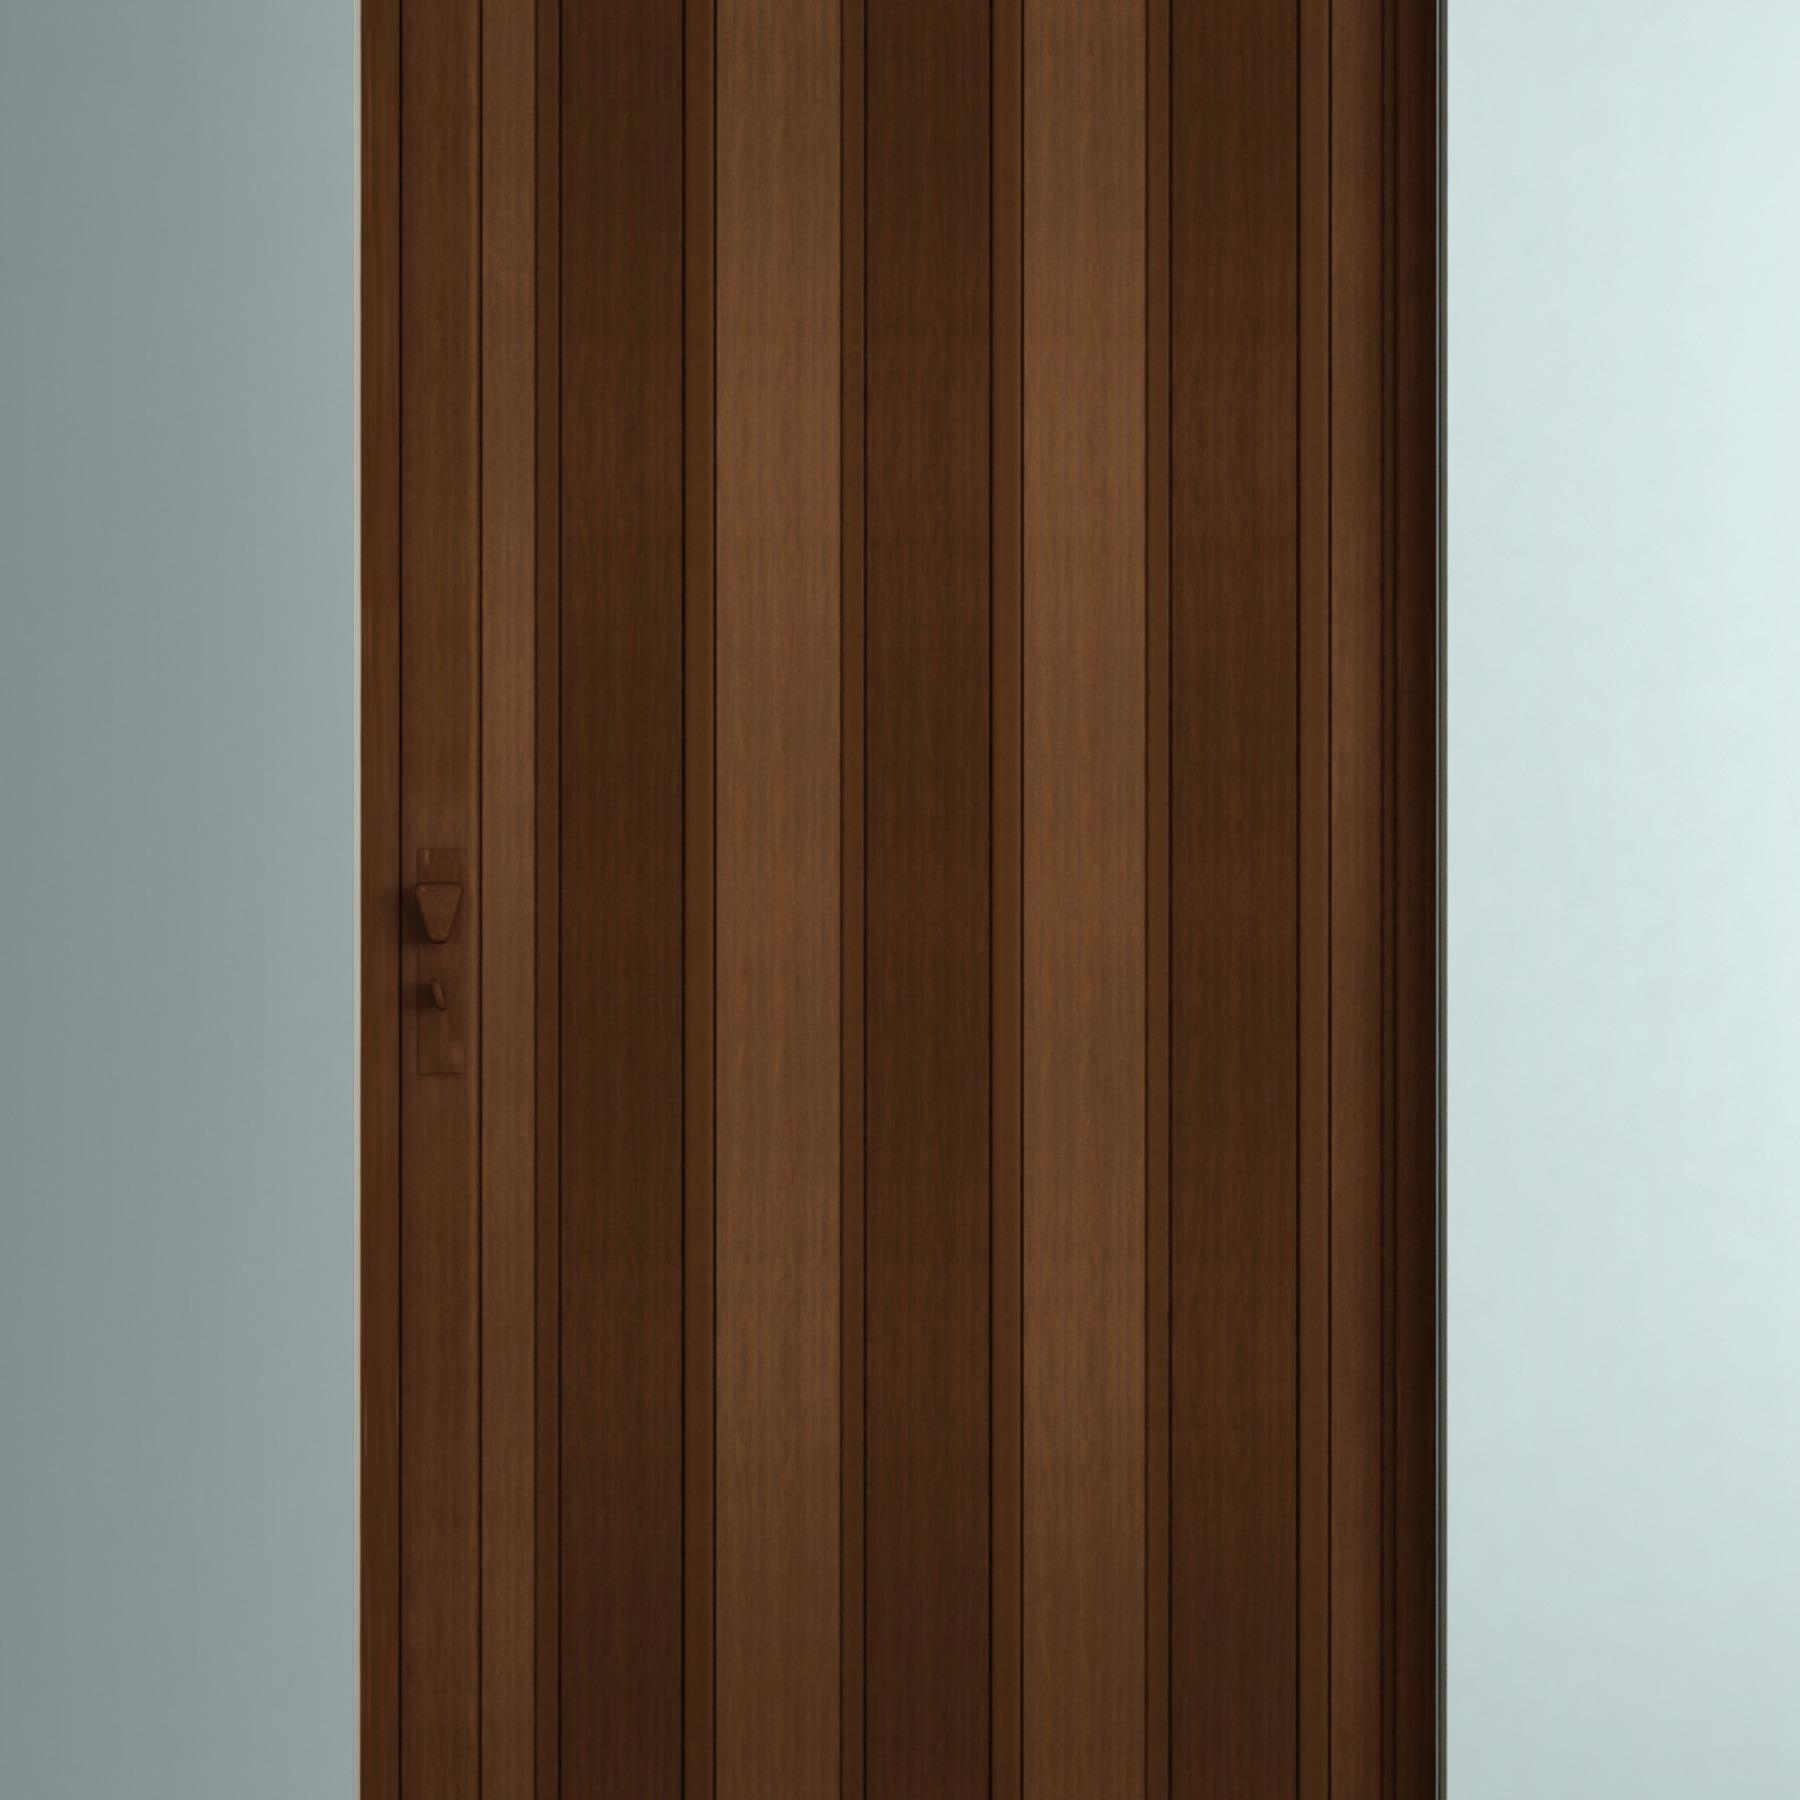 Porta montada sanfonado lisa pl stico ambos os lados 2 - Porta carta igienica leroy merlin ...